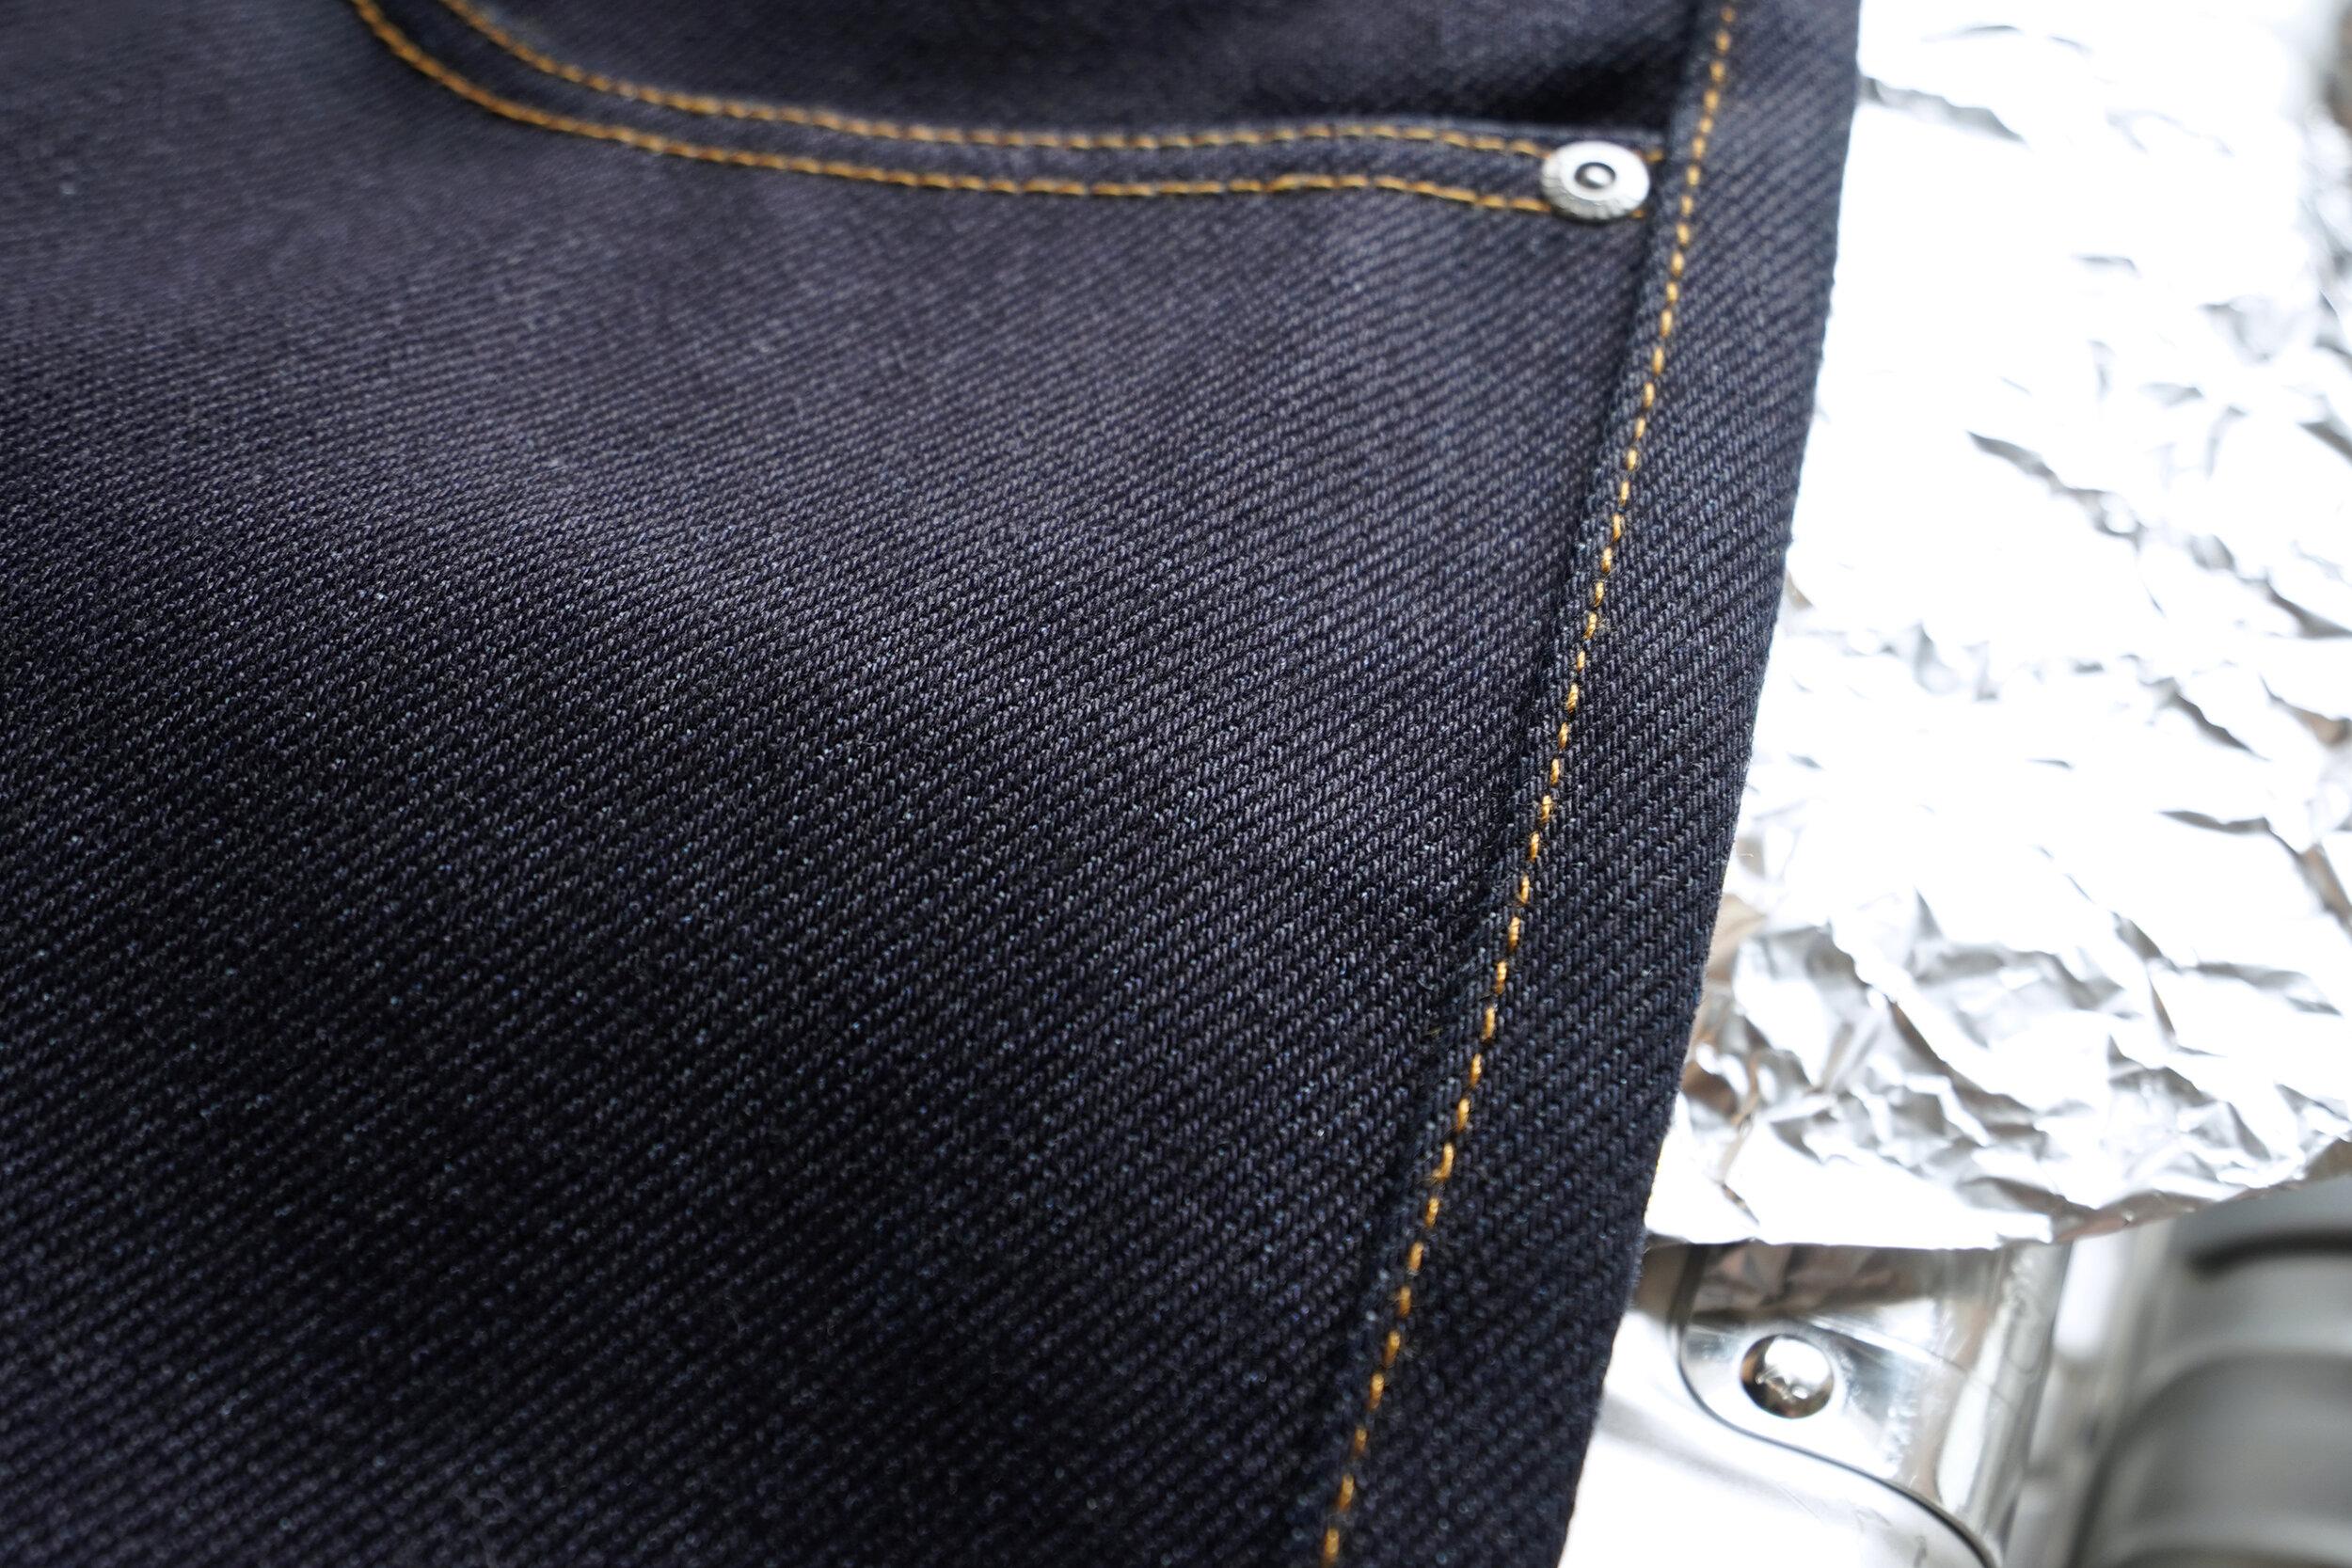 Elephant X - Fabric Close Up